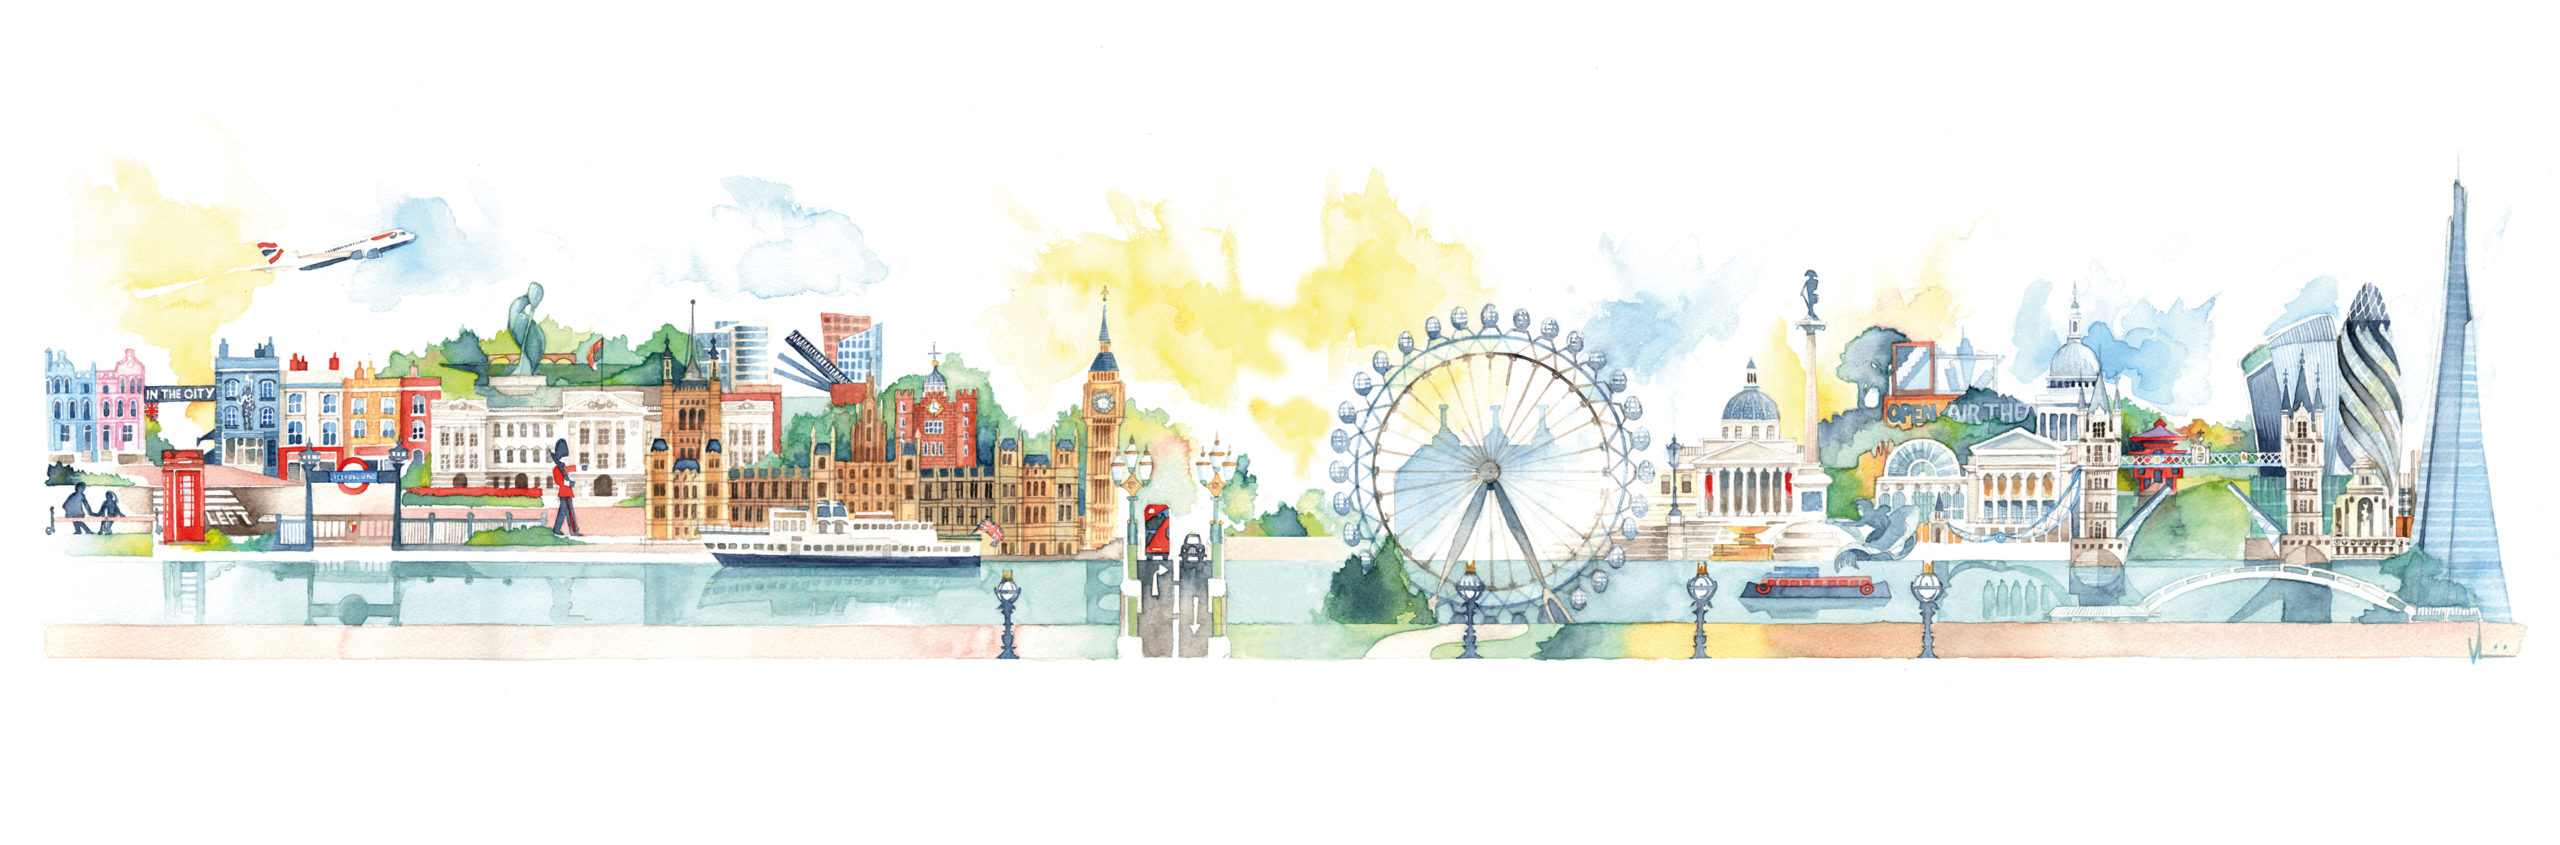 Londra_100x33